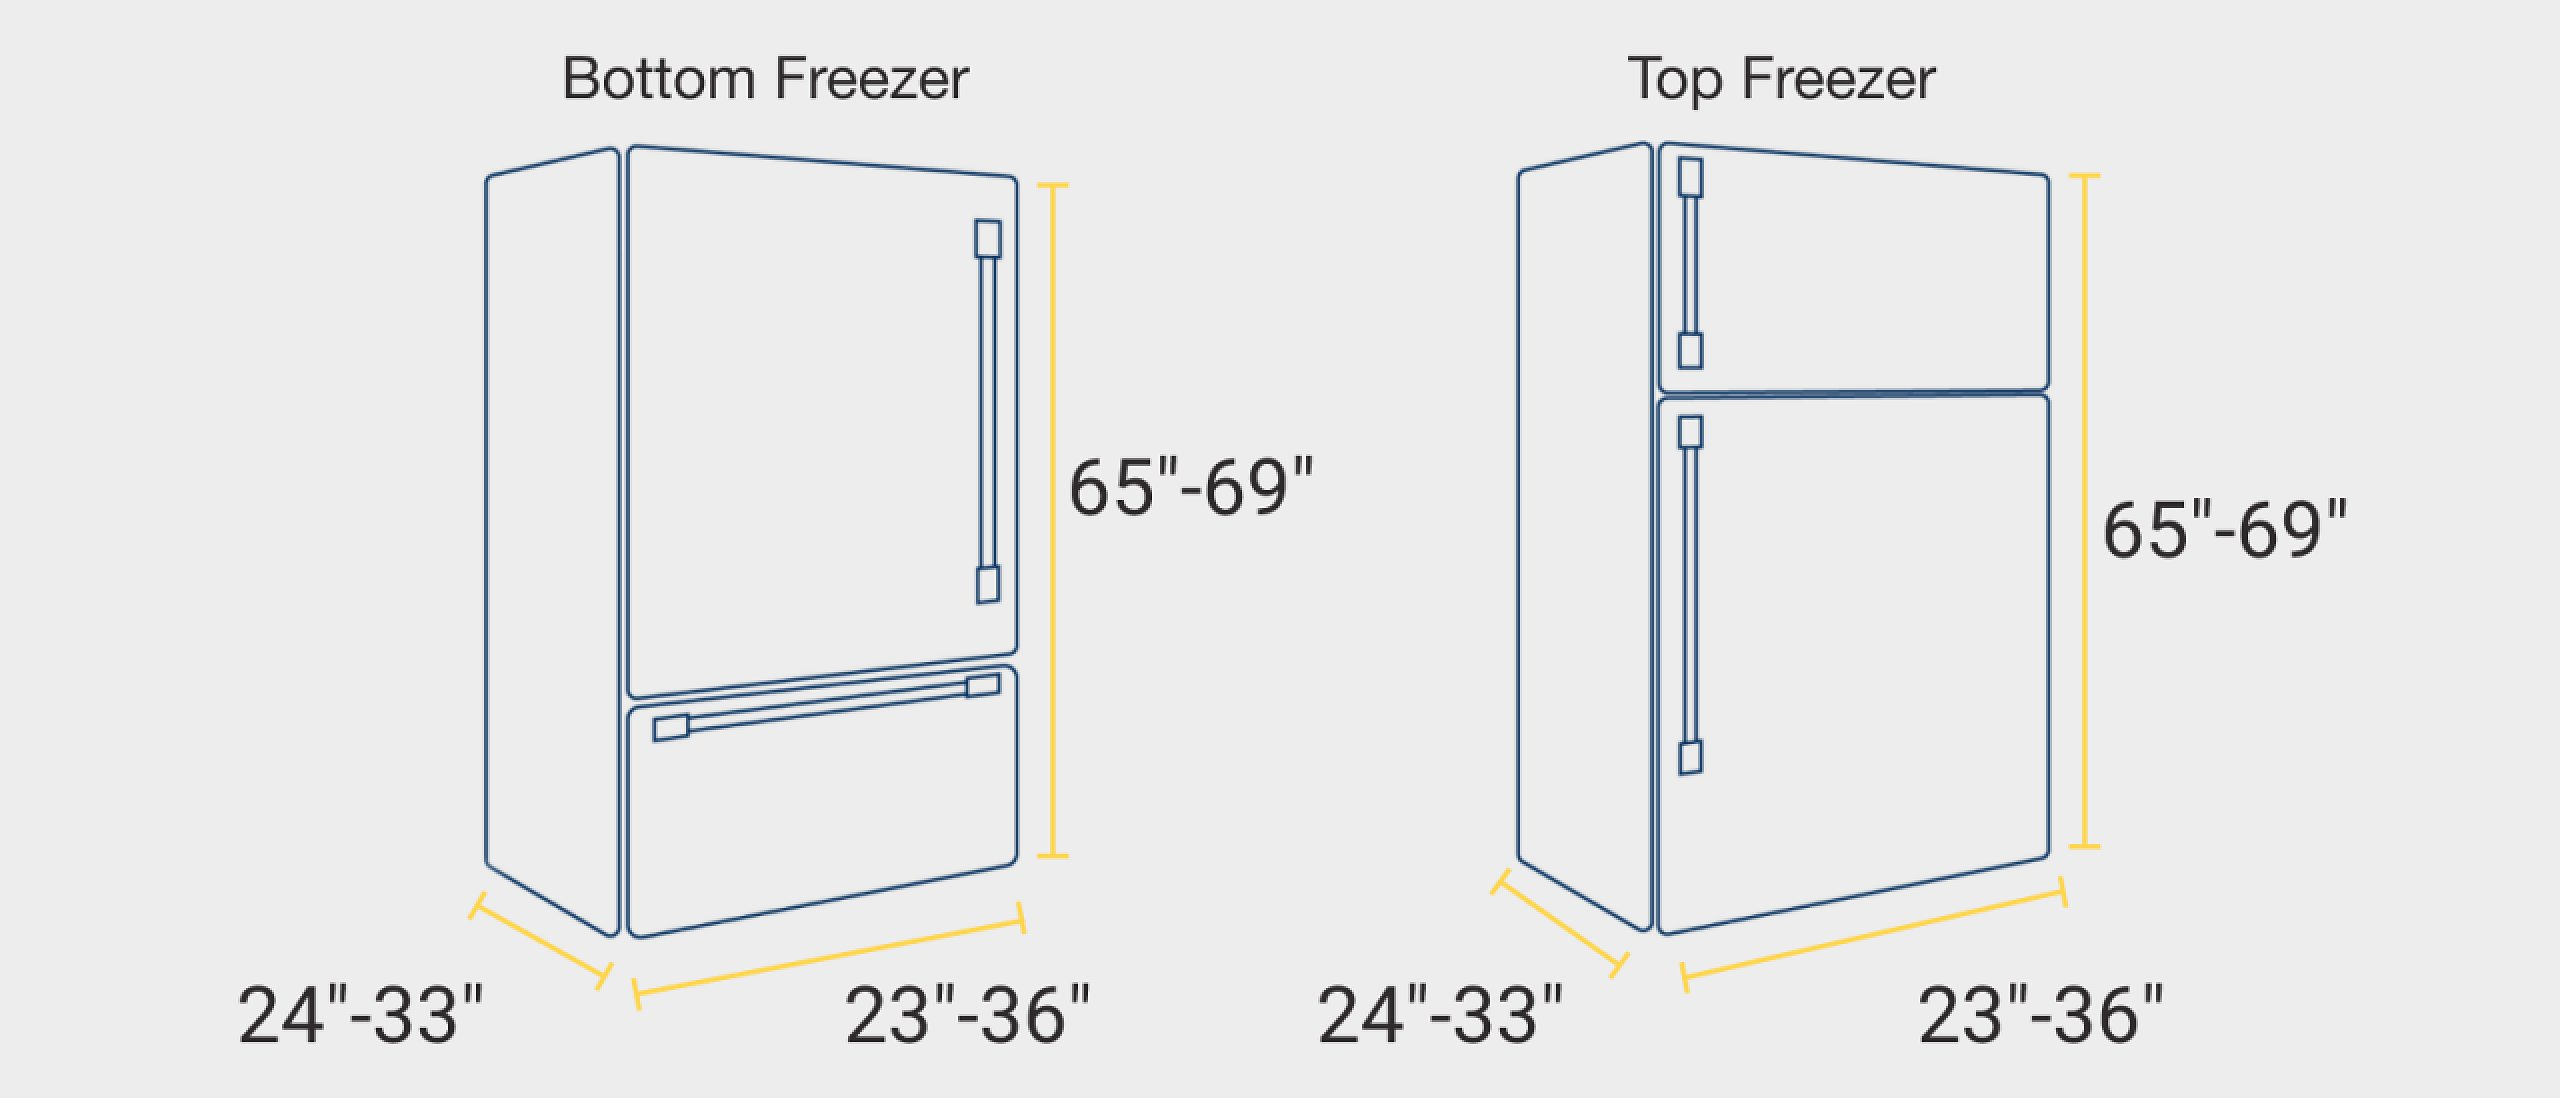 Bottom freezer and top freezer refrigerator measurements